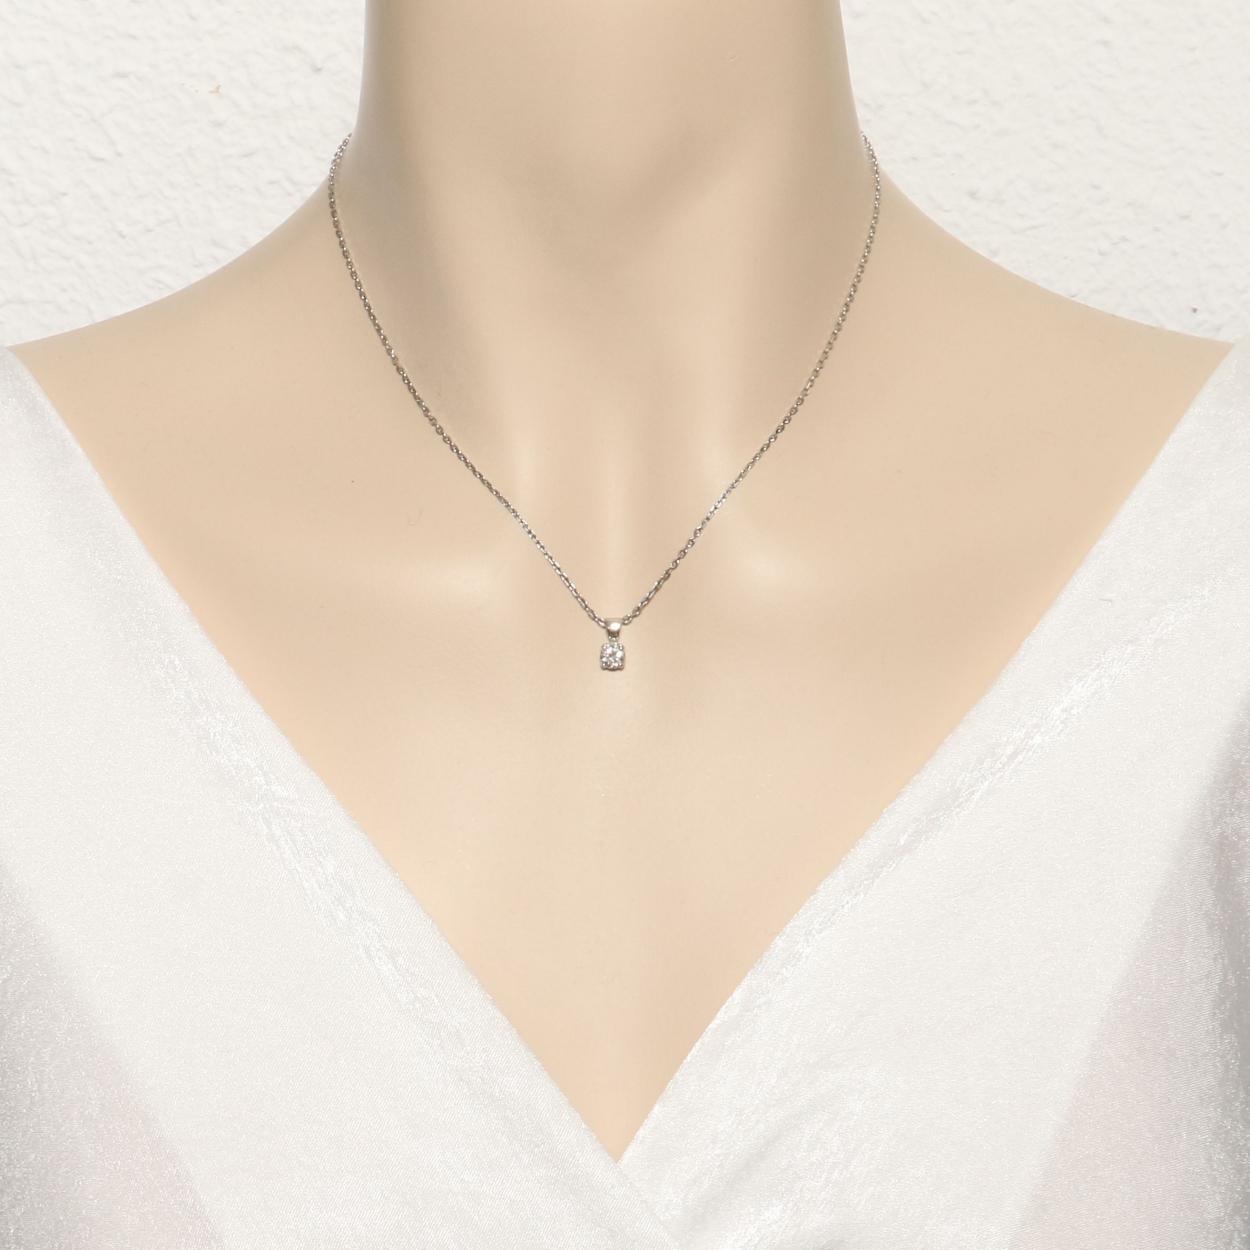 pendentif solitaire or blanc 750 diamant ki1 ref 44636. Black Bedroom Furniture Sets. Home Design Ideas